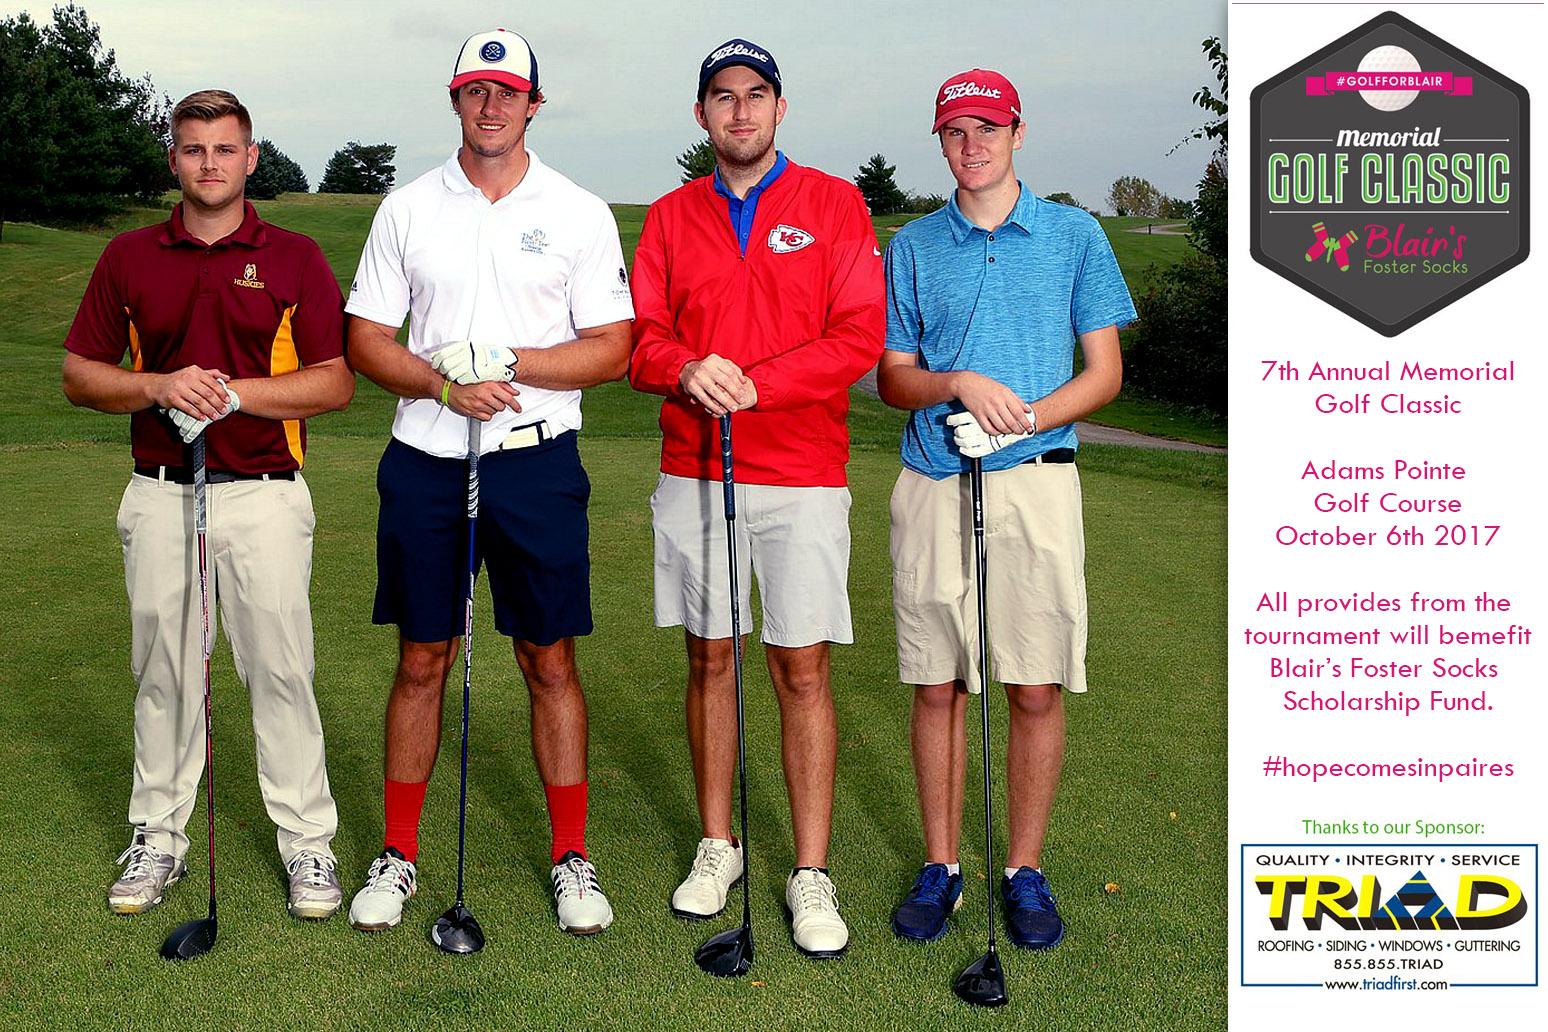 golf tournament photography - sponsor team photo 1